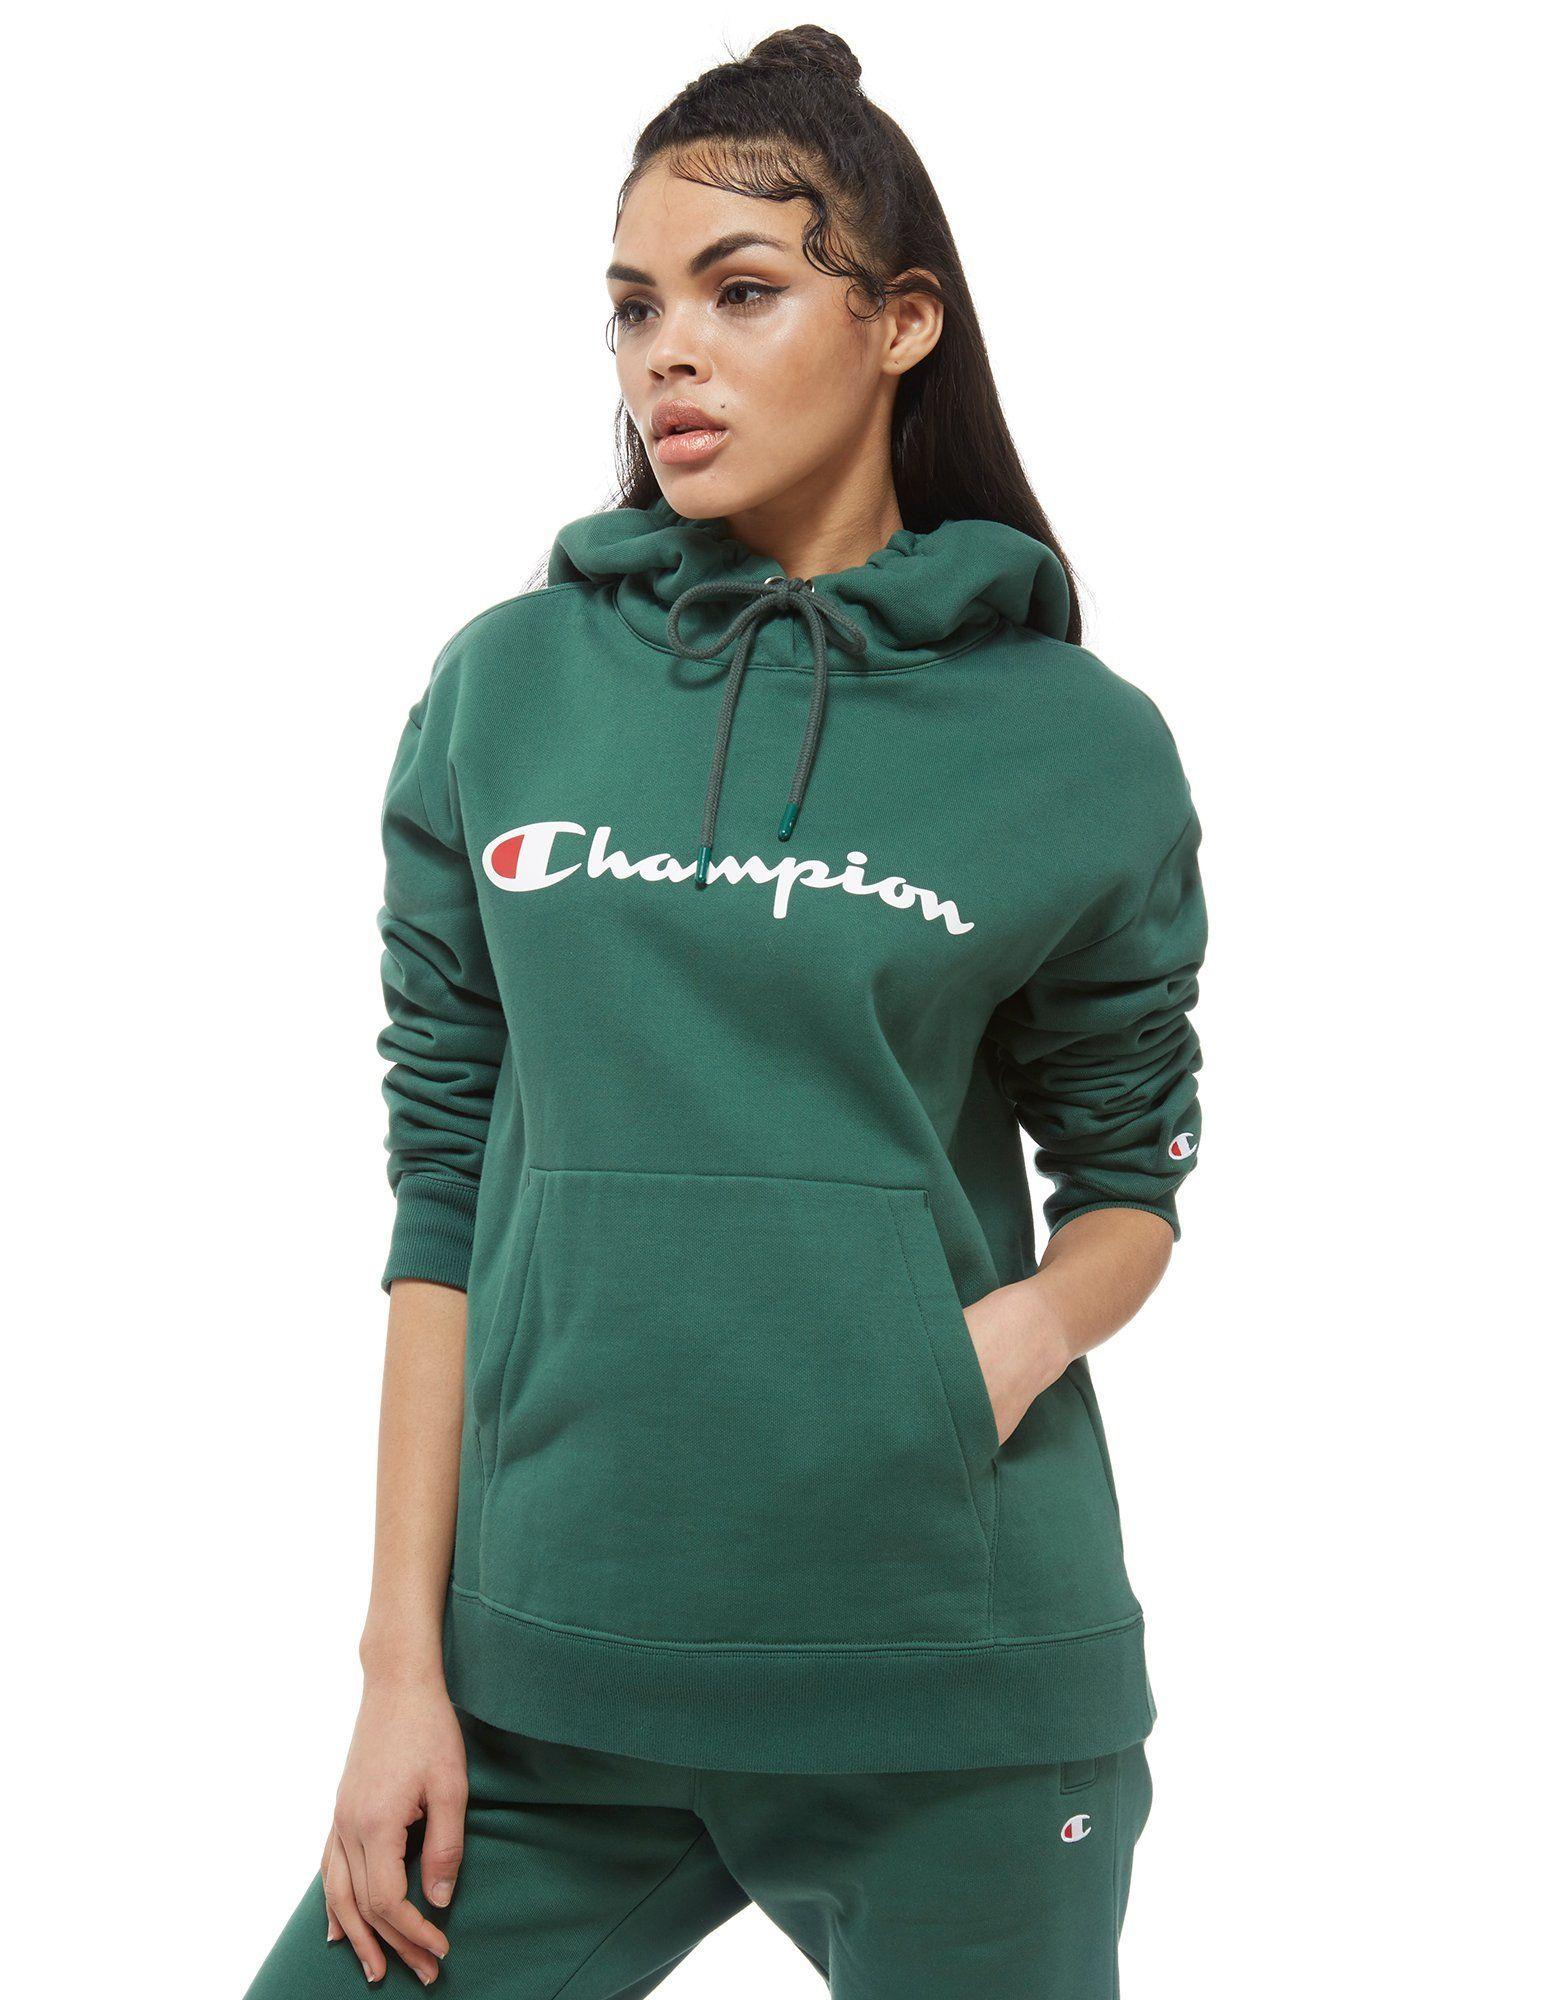 Champion Script Logo Boyfriend Hoodie Dames – Online winkelen Champion  Script Logo Boyfriend Hoodie Dames bij 04708b5efad2